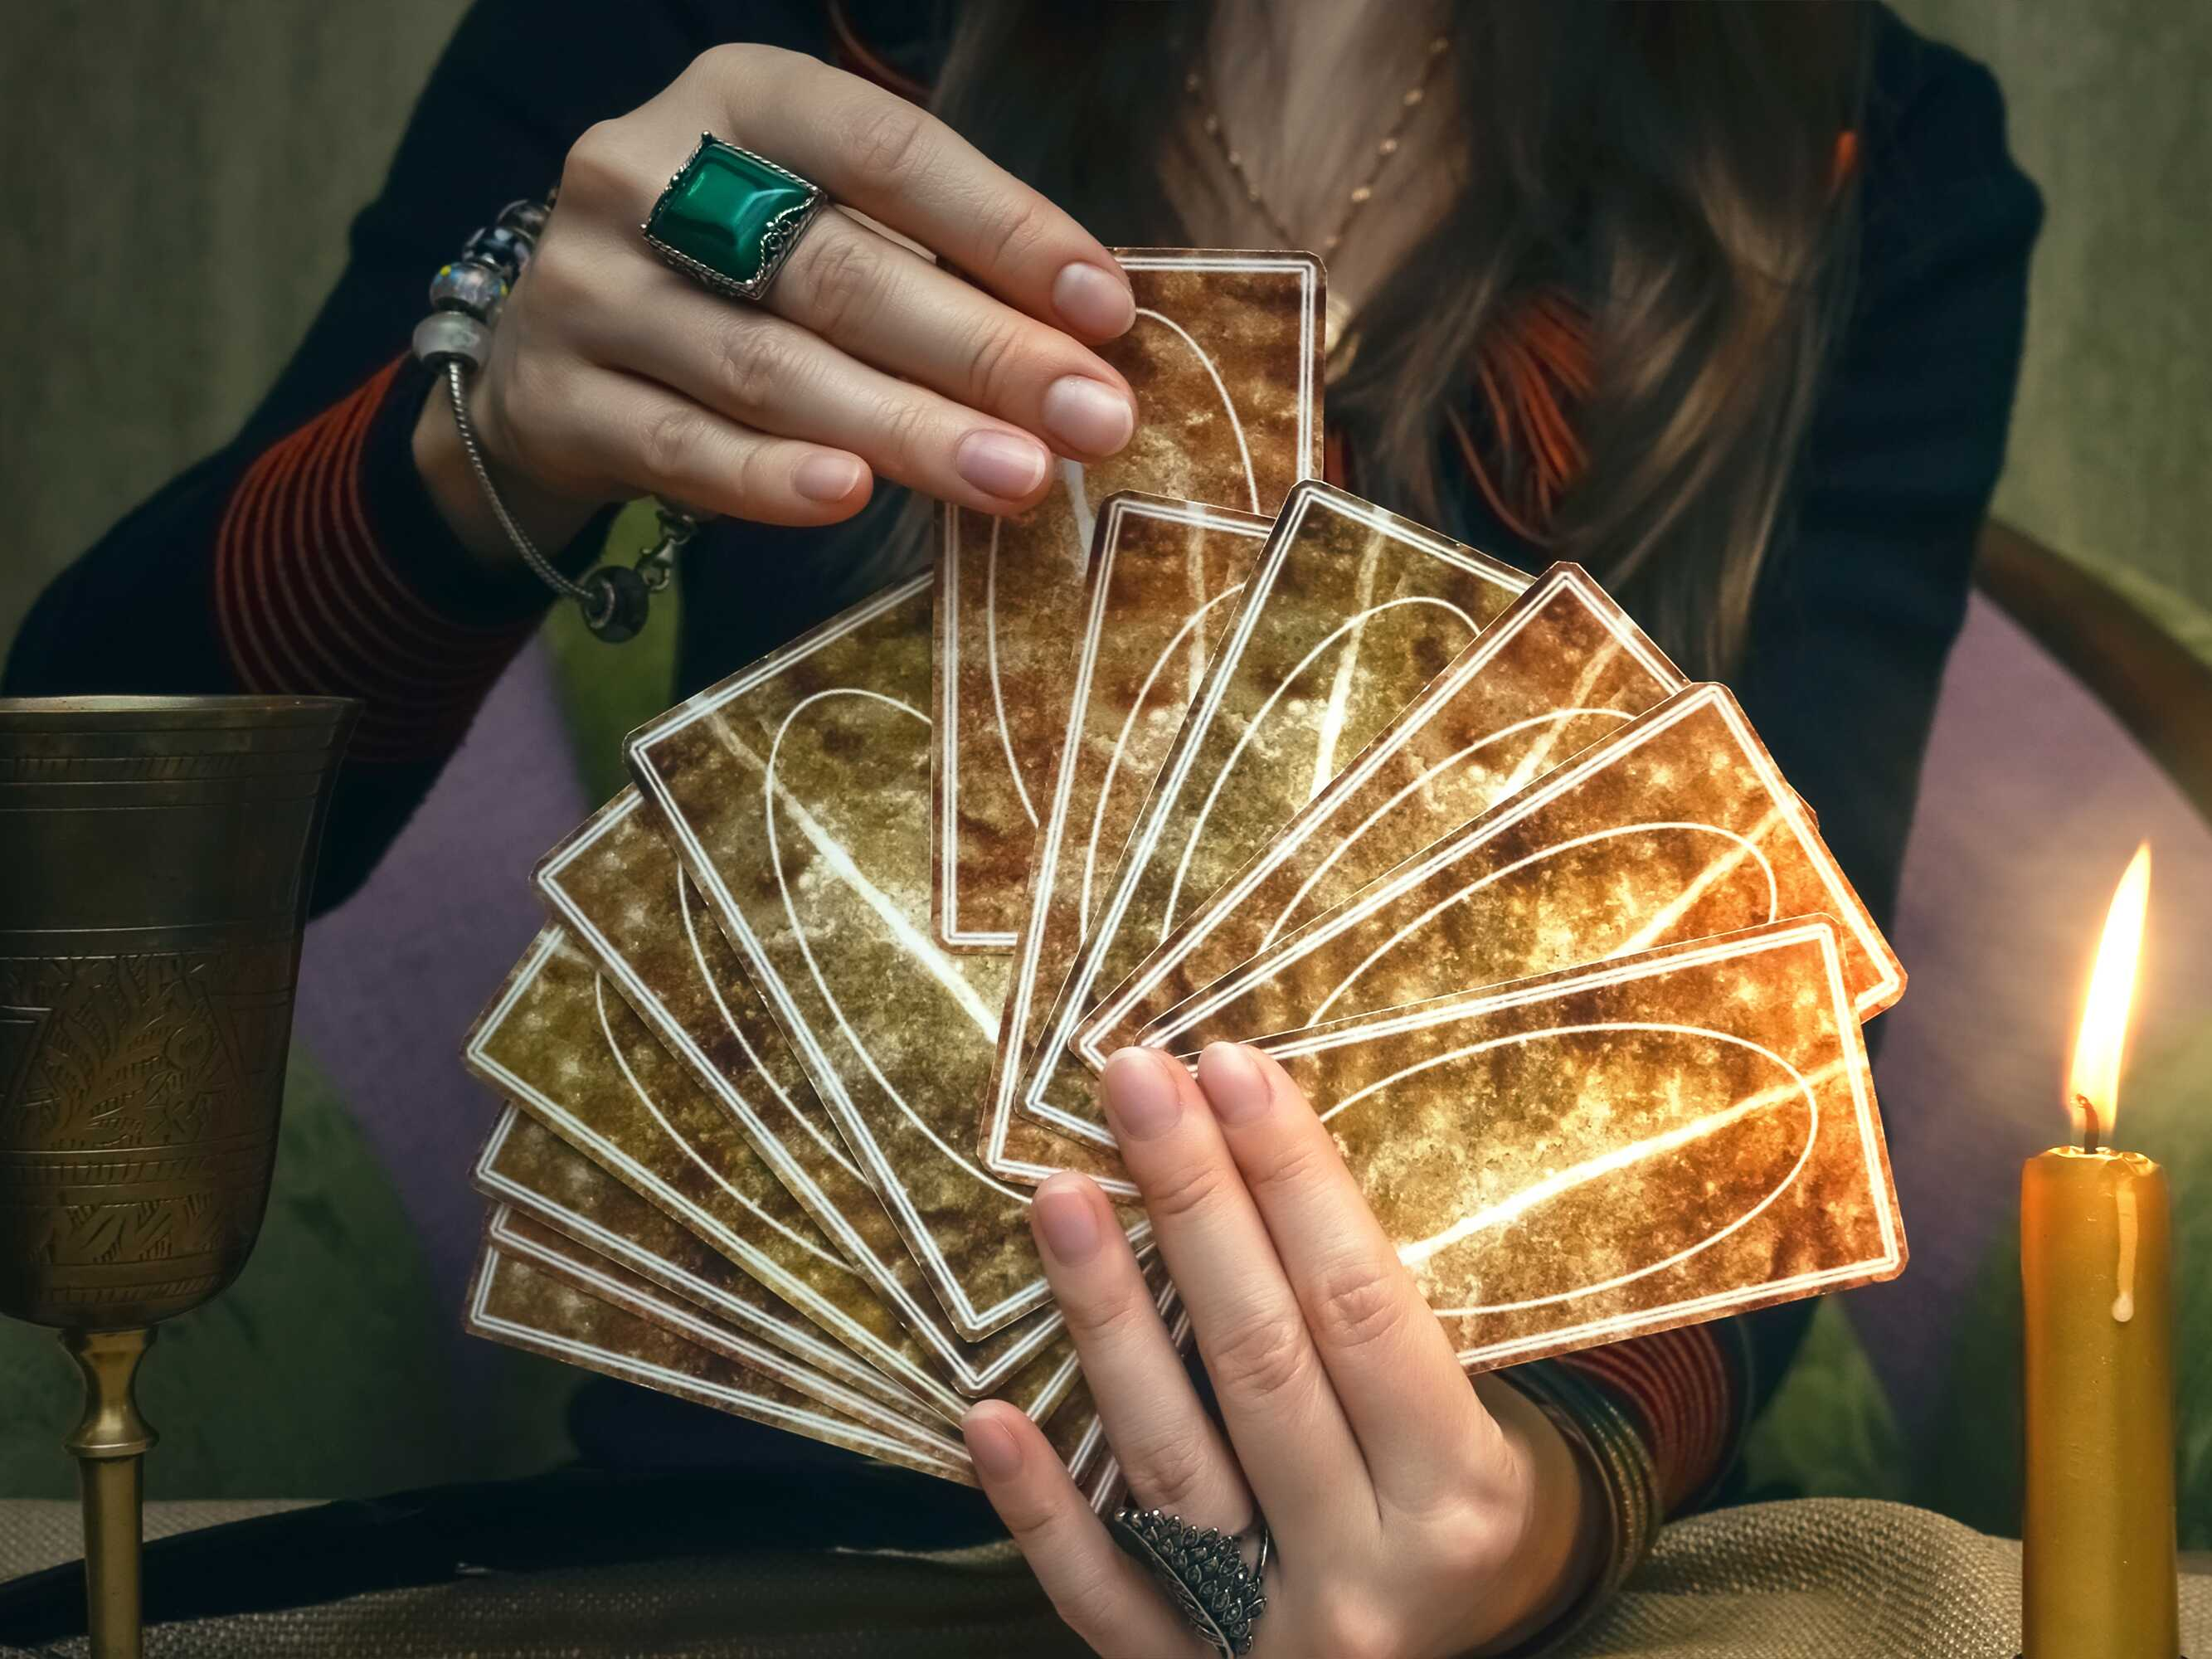 party-entertainment-tarot-card-reader-istock